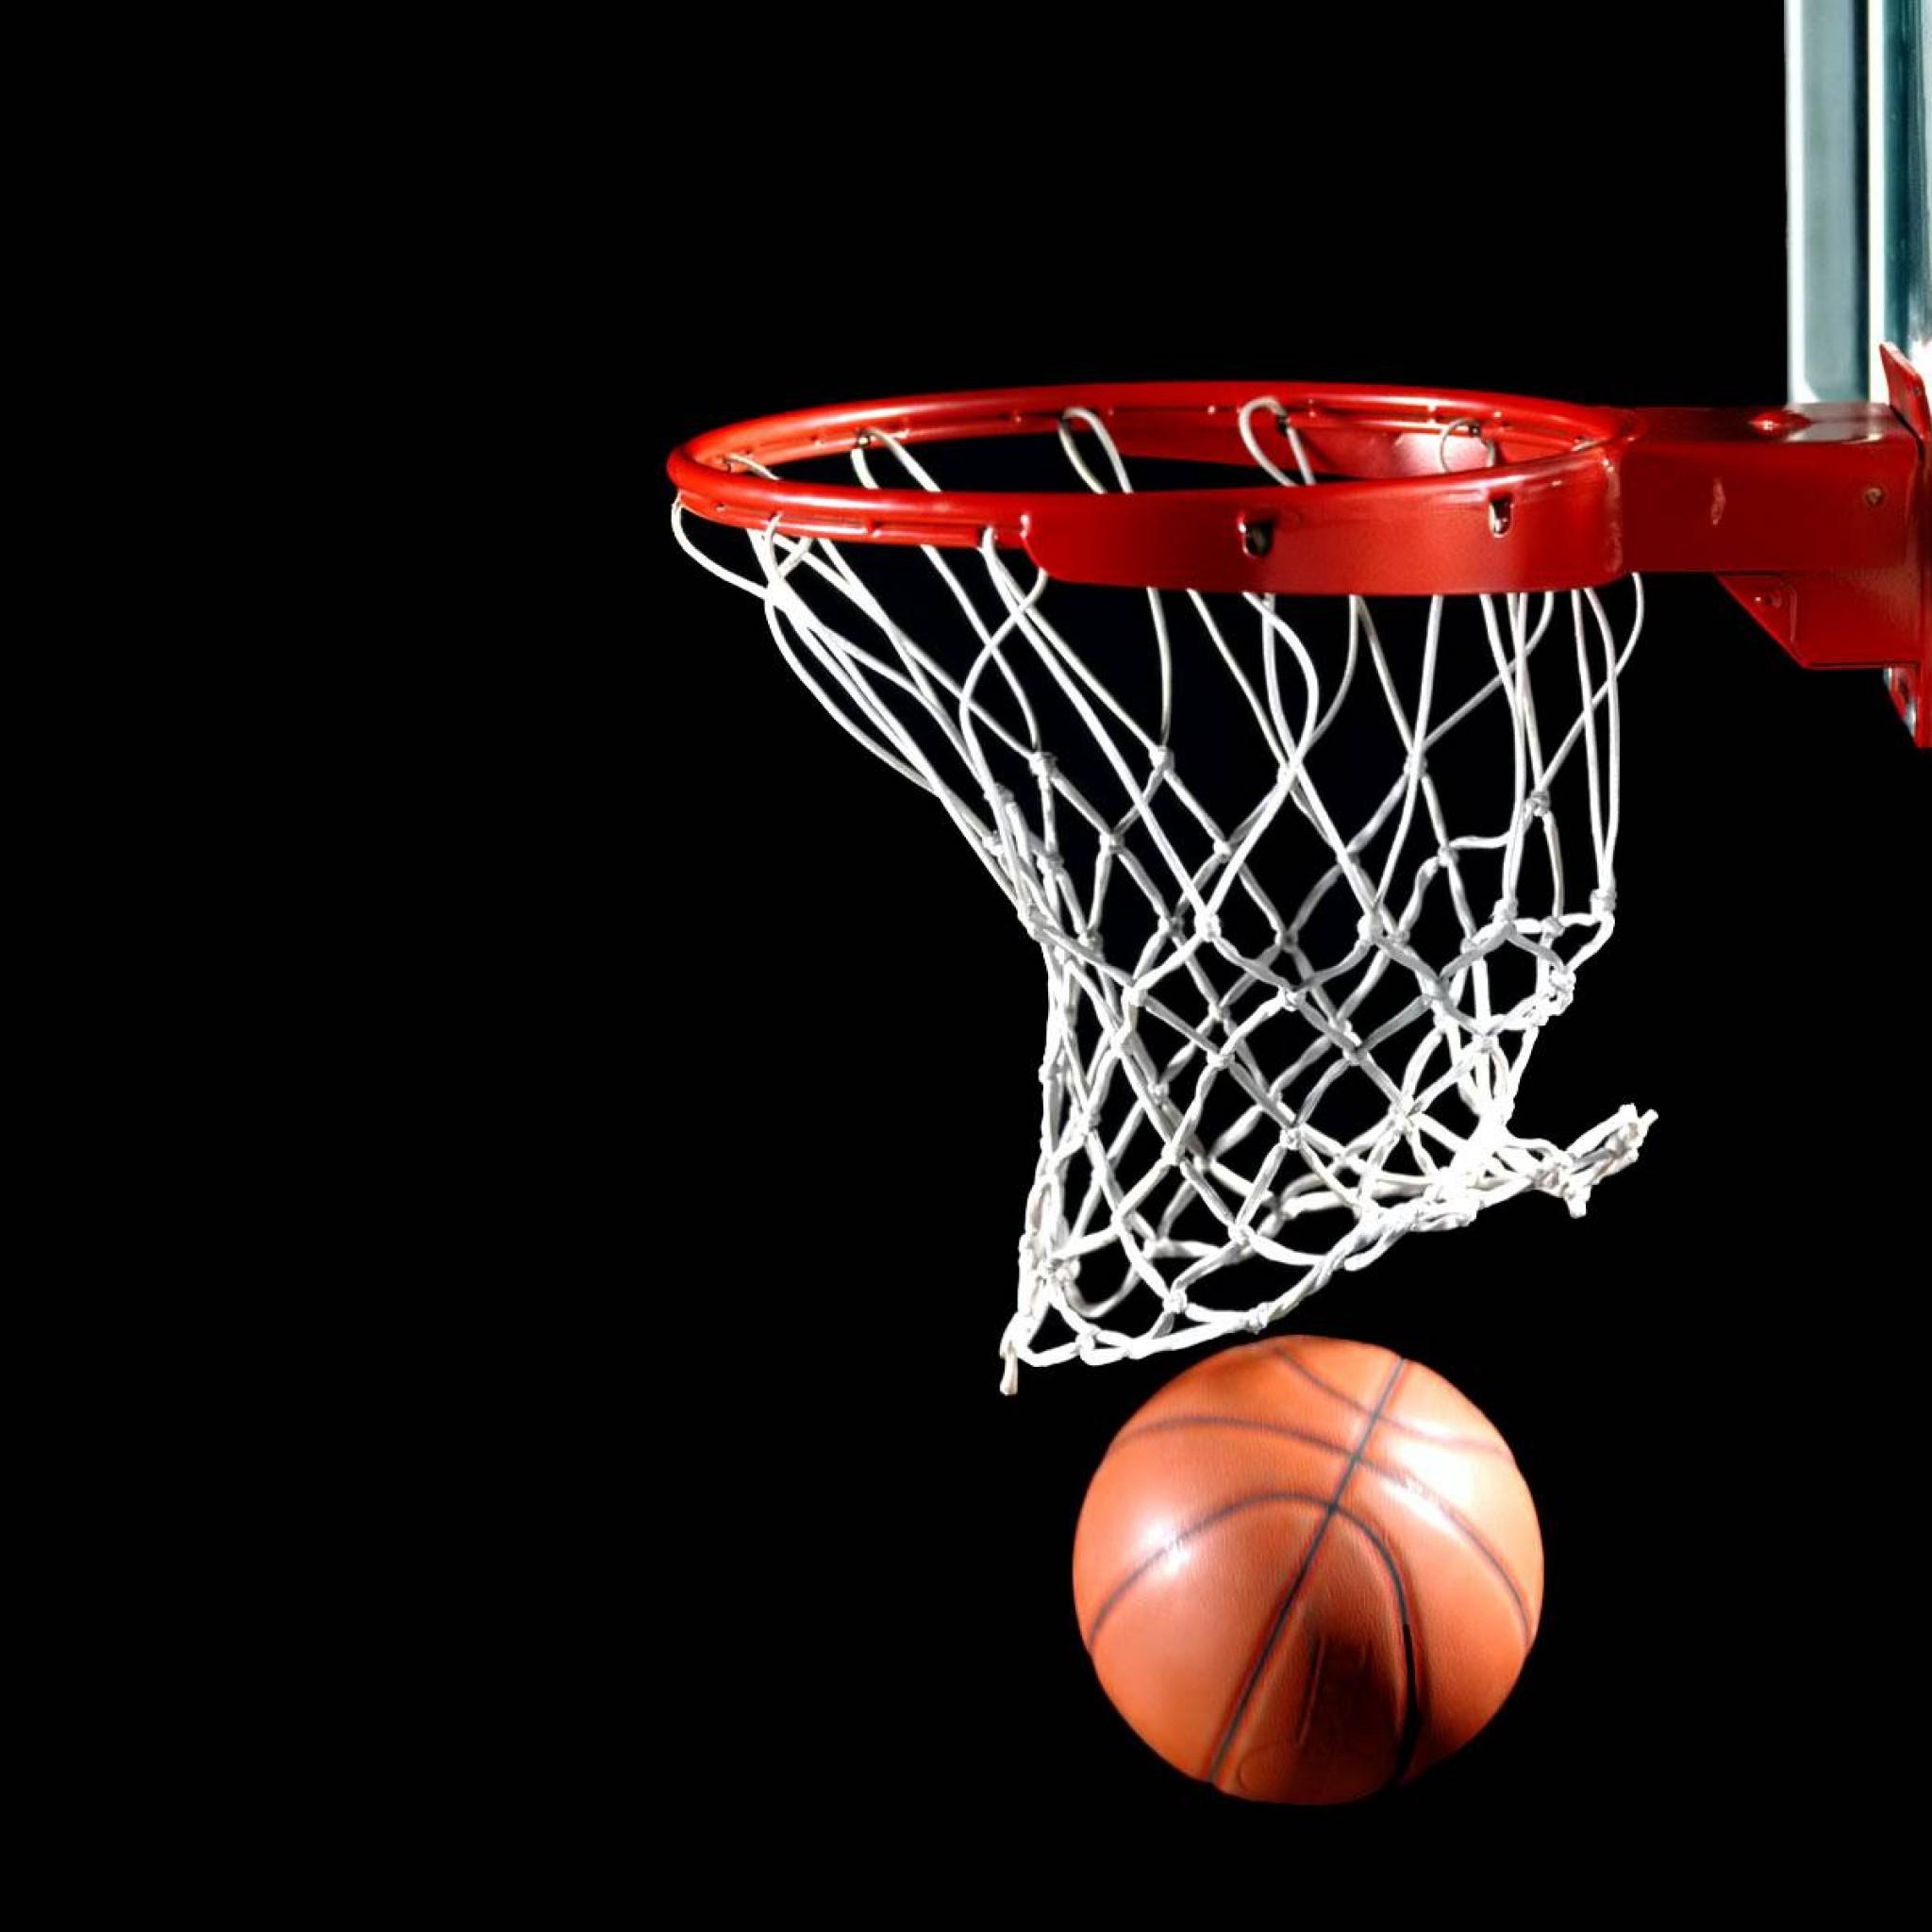 FunMozar Basketball Wallpapers IPhone 2048x2048